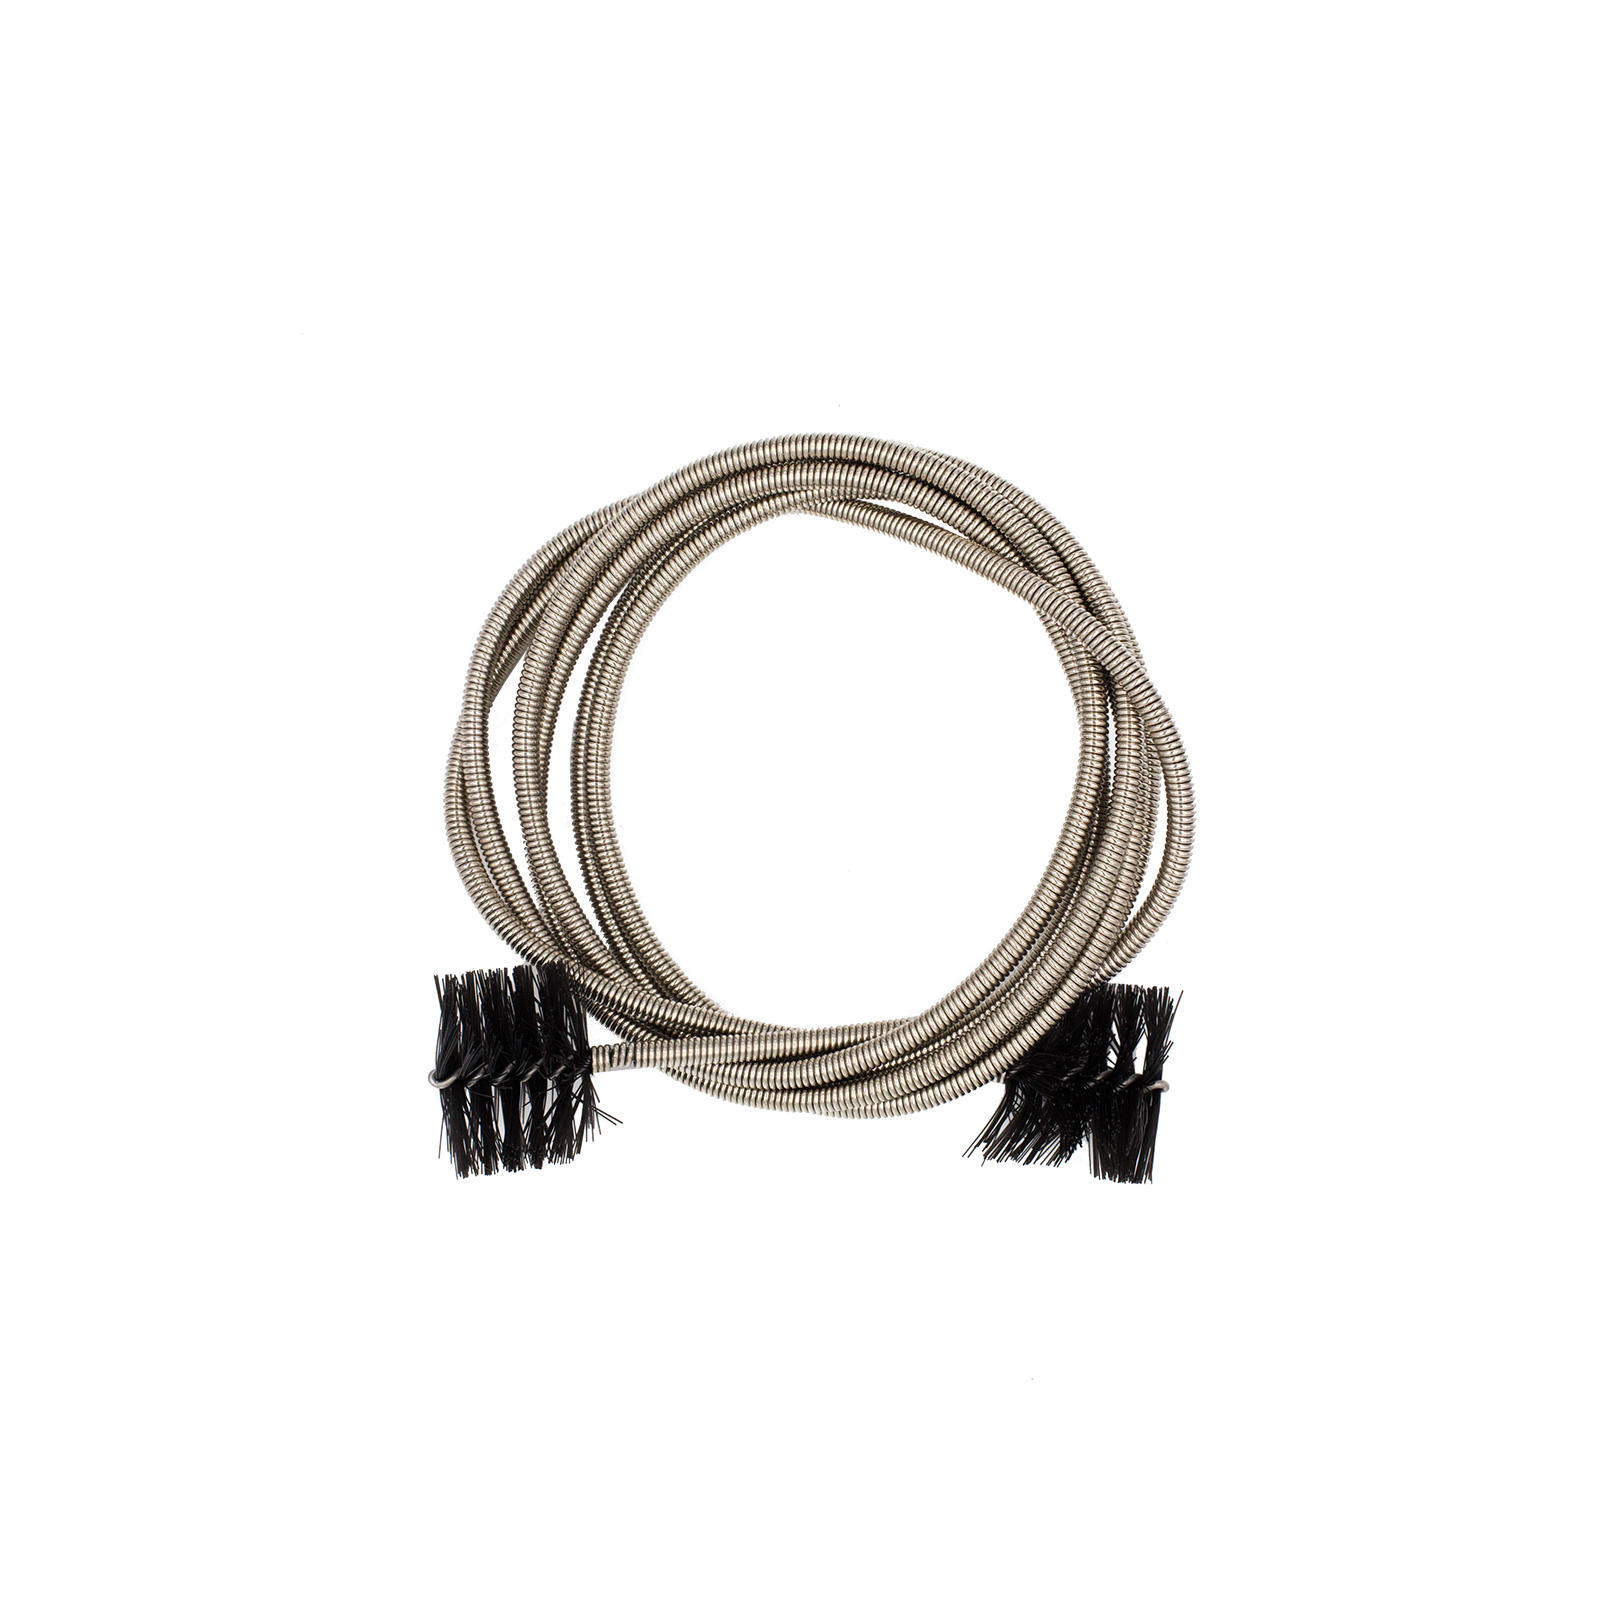 Superslick Superslick Wire Baritone/Tuba Snake